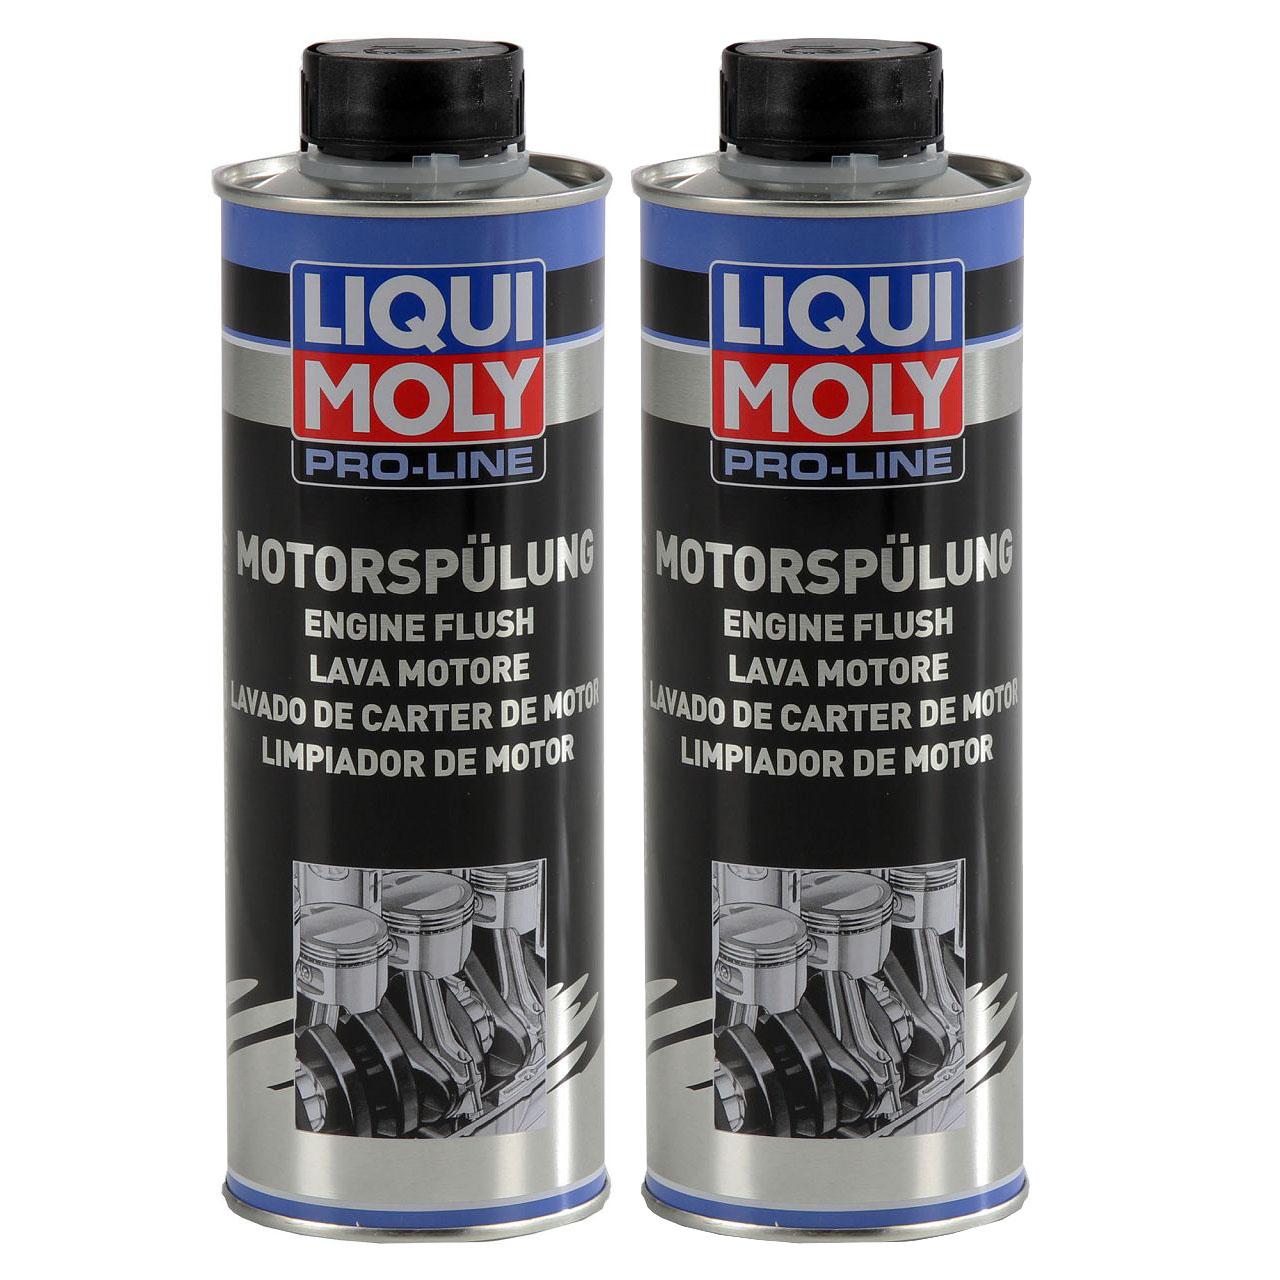 LIQUI MOLY 2427 PRO-LINE Motorspülung Motorreinigung Schlammspülung 2x 500 ml